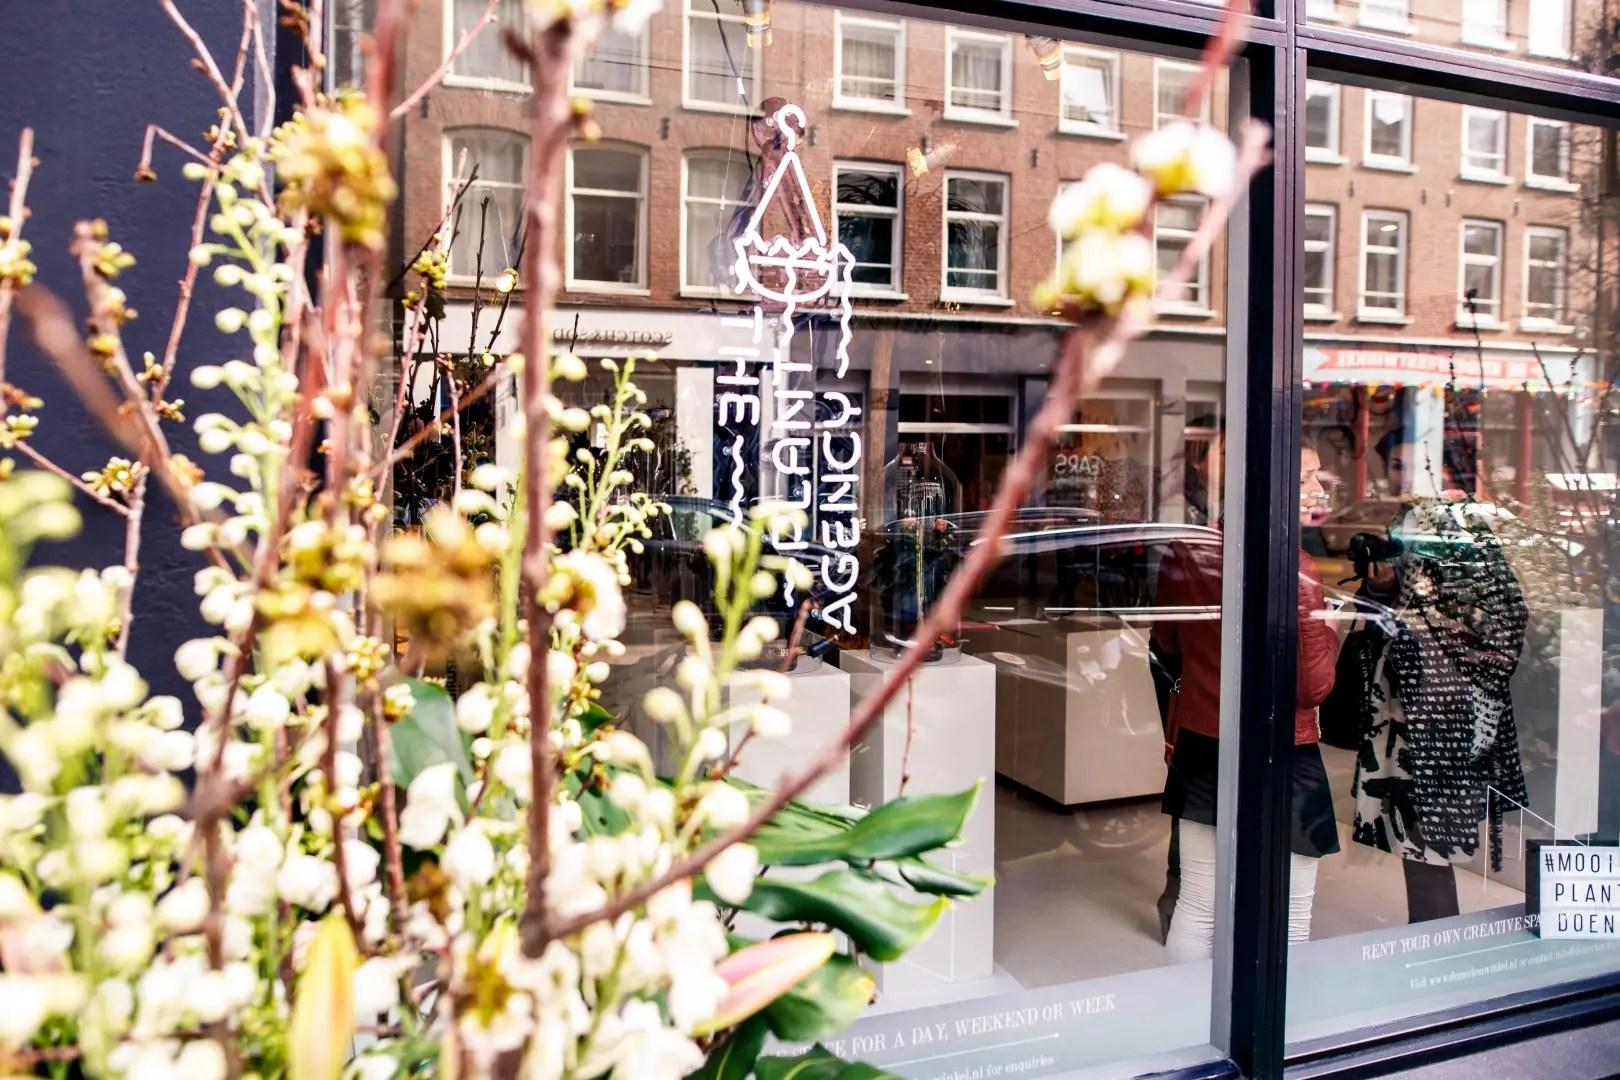 Binnenkijken Thuis Femke : Binnenkijken archieven u pagina van u stijlvol styling